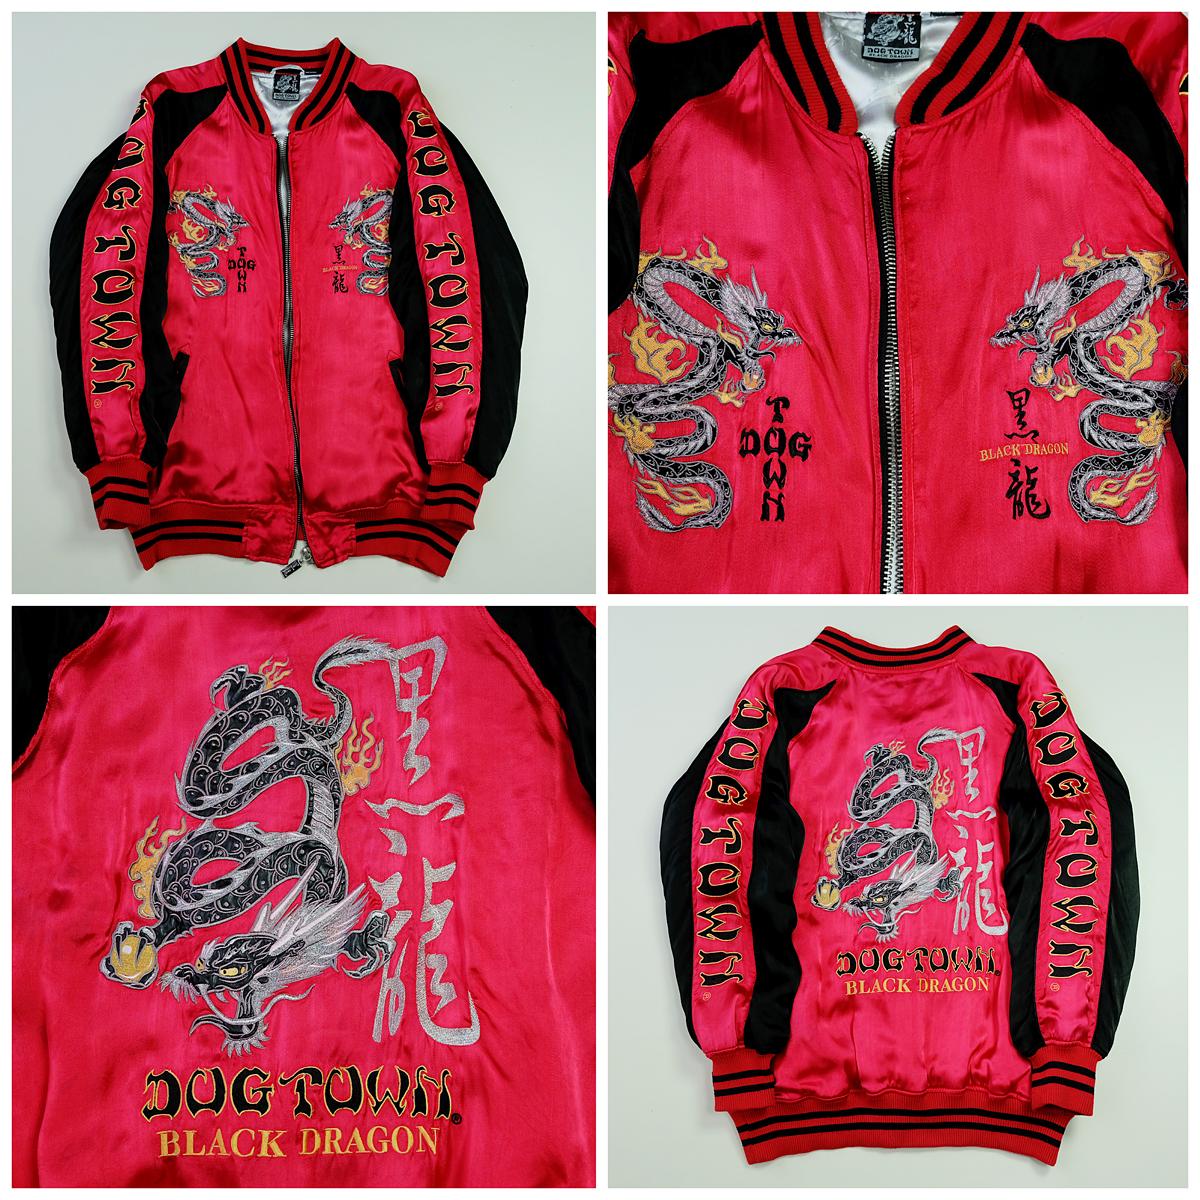 44516735a4d Vintage Japanese Dogtown Red Black Dragon Embroidered Sukajan Souvenir  Jacket - Japan Lover Me Store